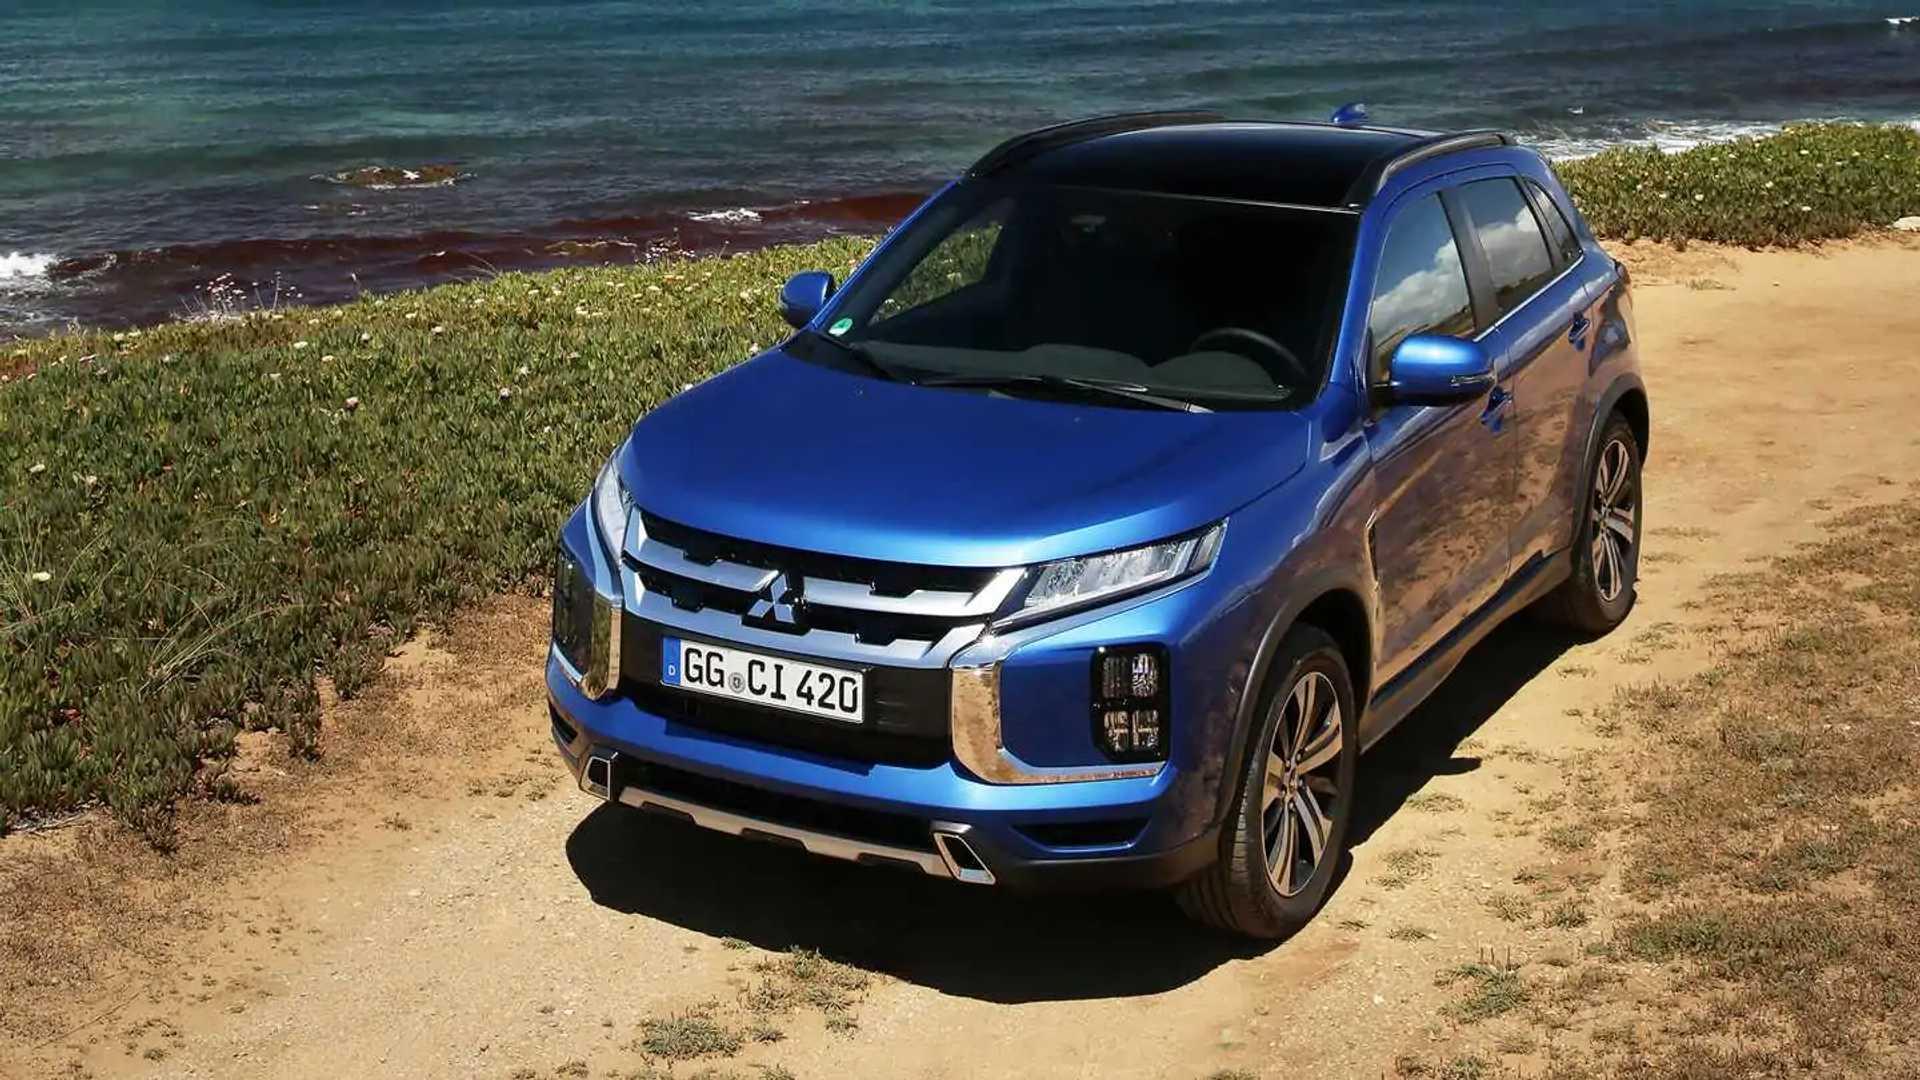 2020 Mitsubishi Asx Ratings